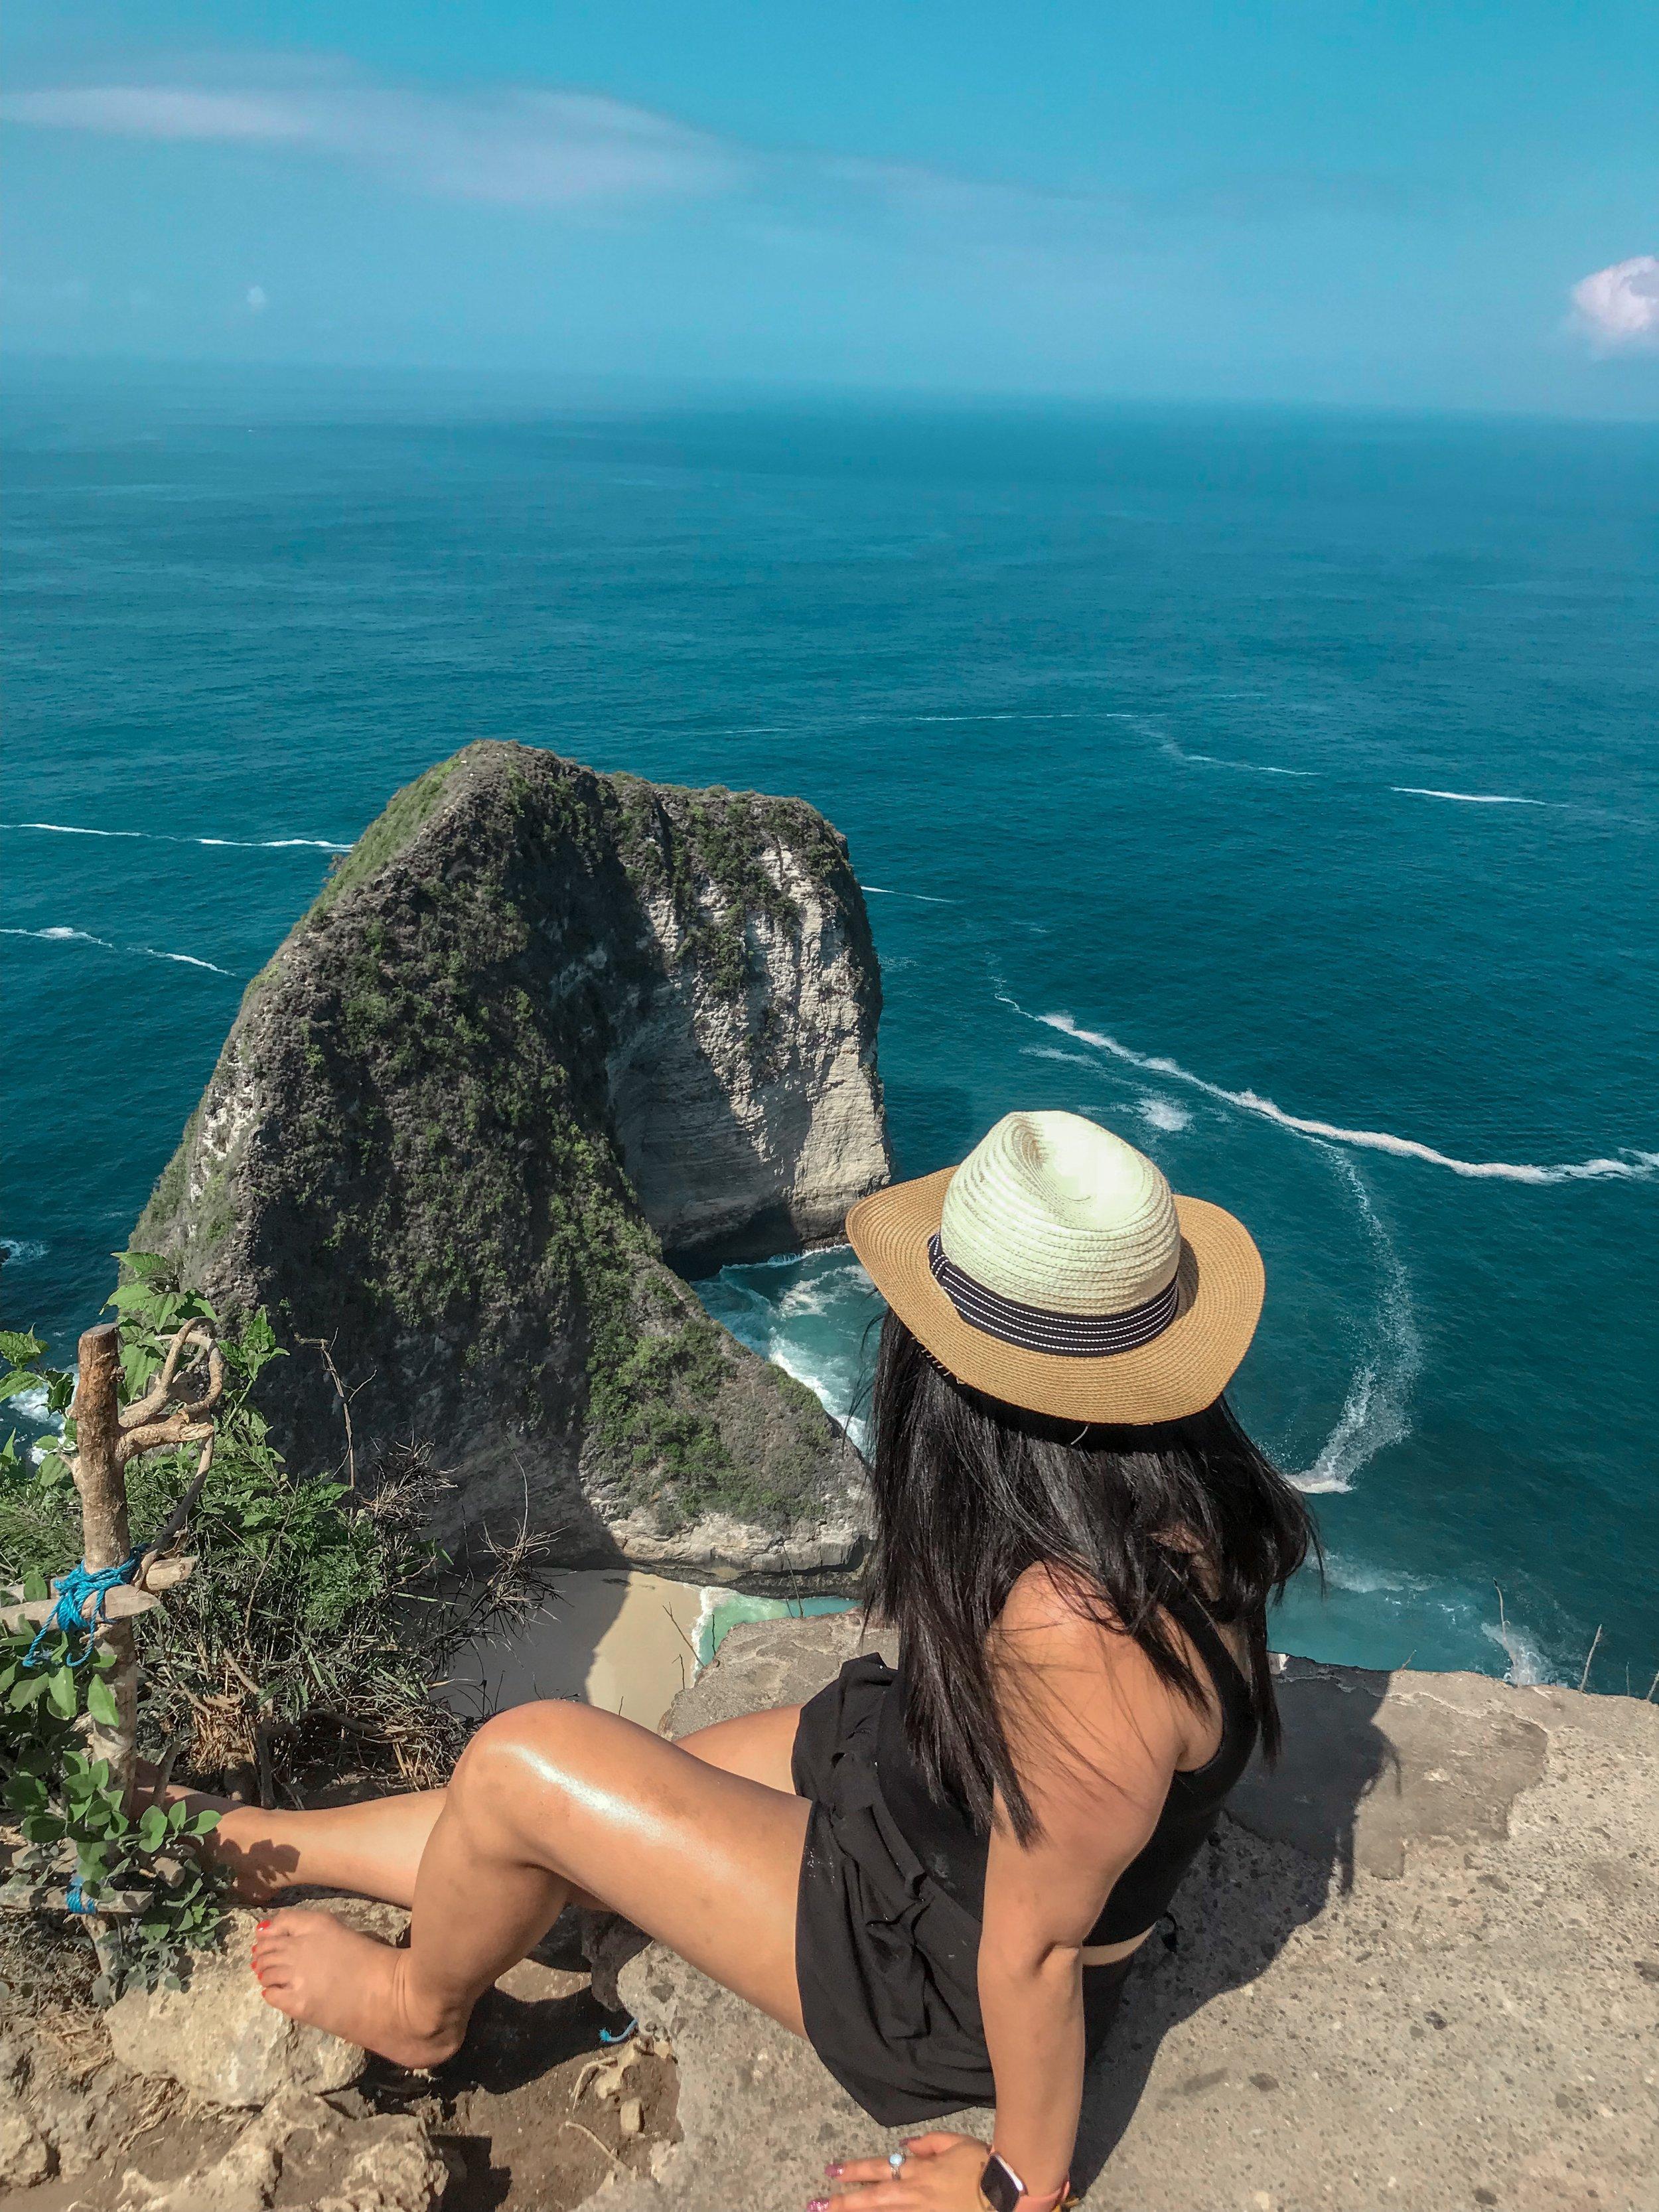 Kelingking Beach, Nusa Penida, October 2018.Ⓒ Not So Basic Life